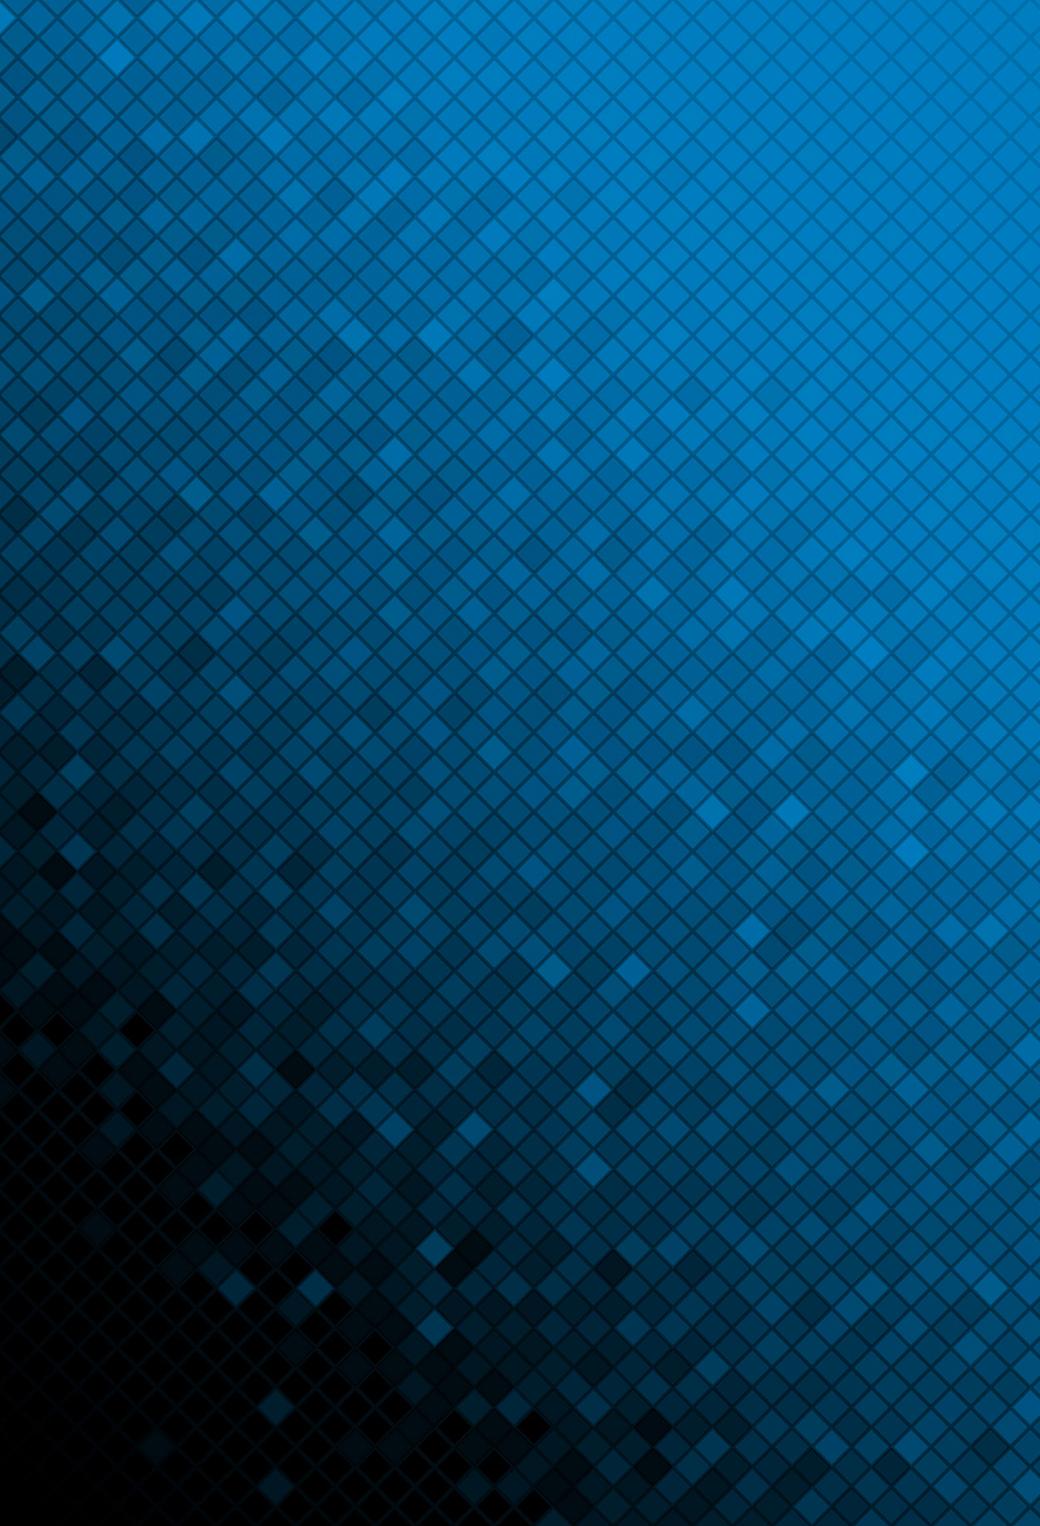 Blue Mosaic 3Wallpapers iphone Parallax Blue Mosaic